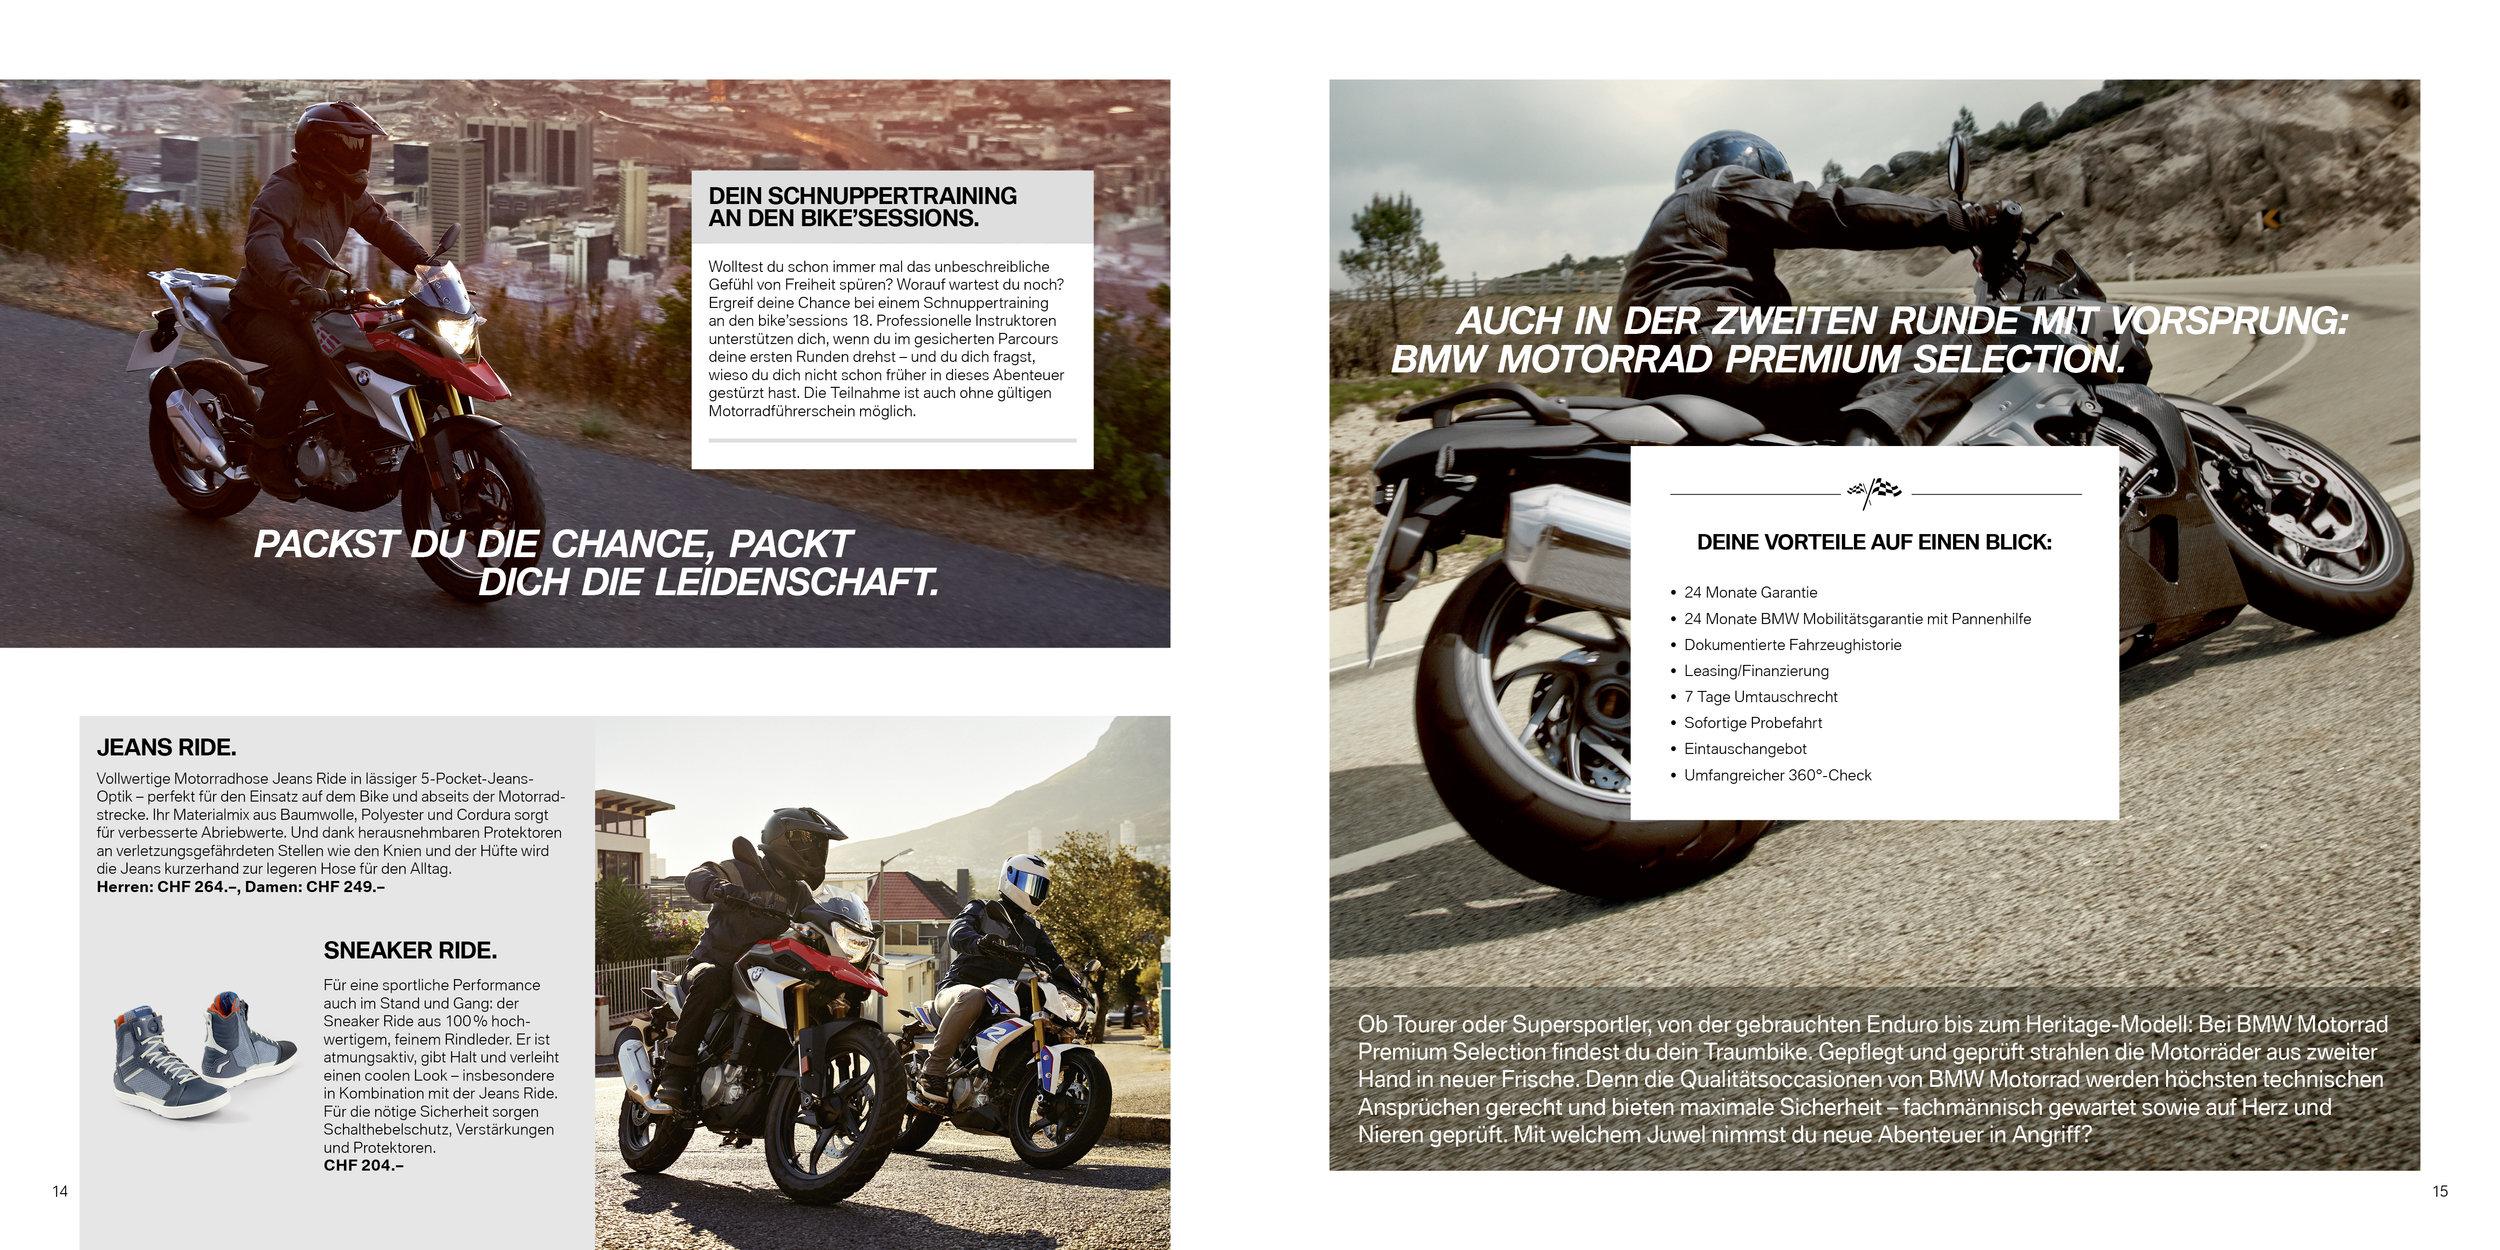 BMW_Saisonflyer_210x210_d_W8.jpg